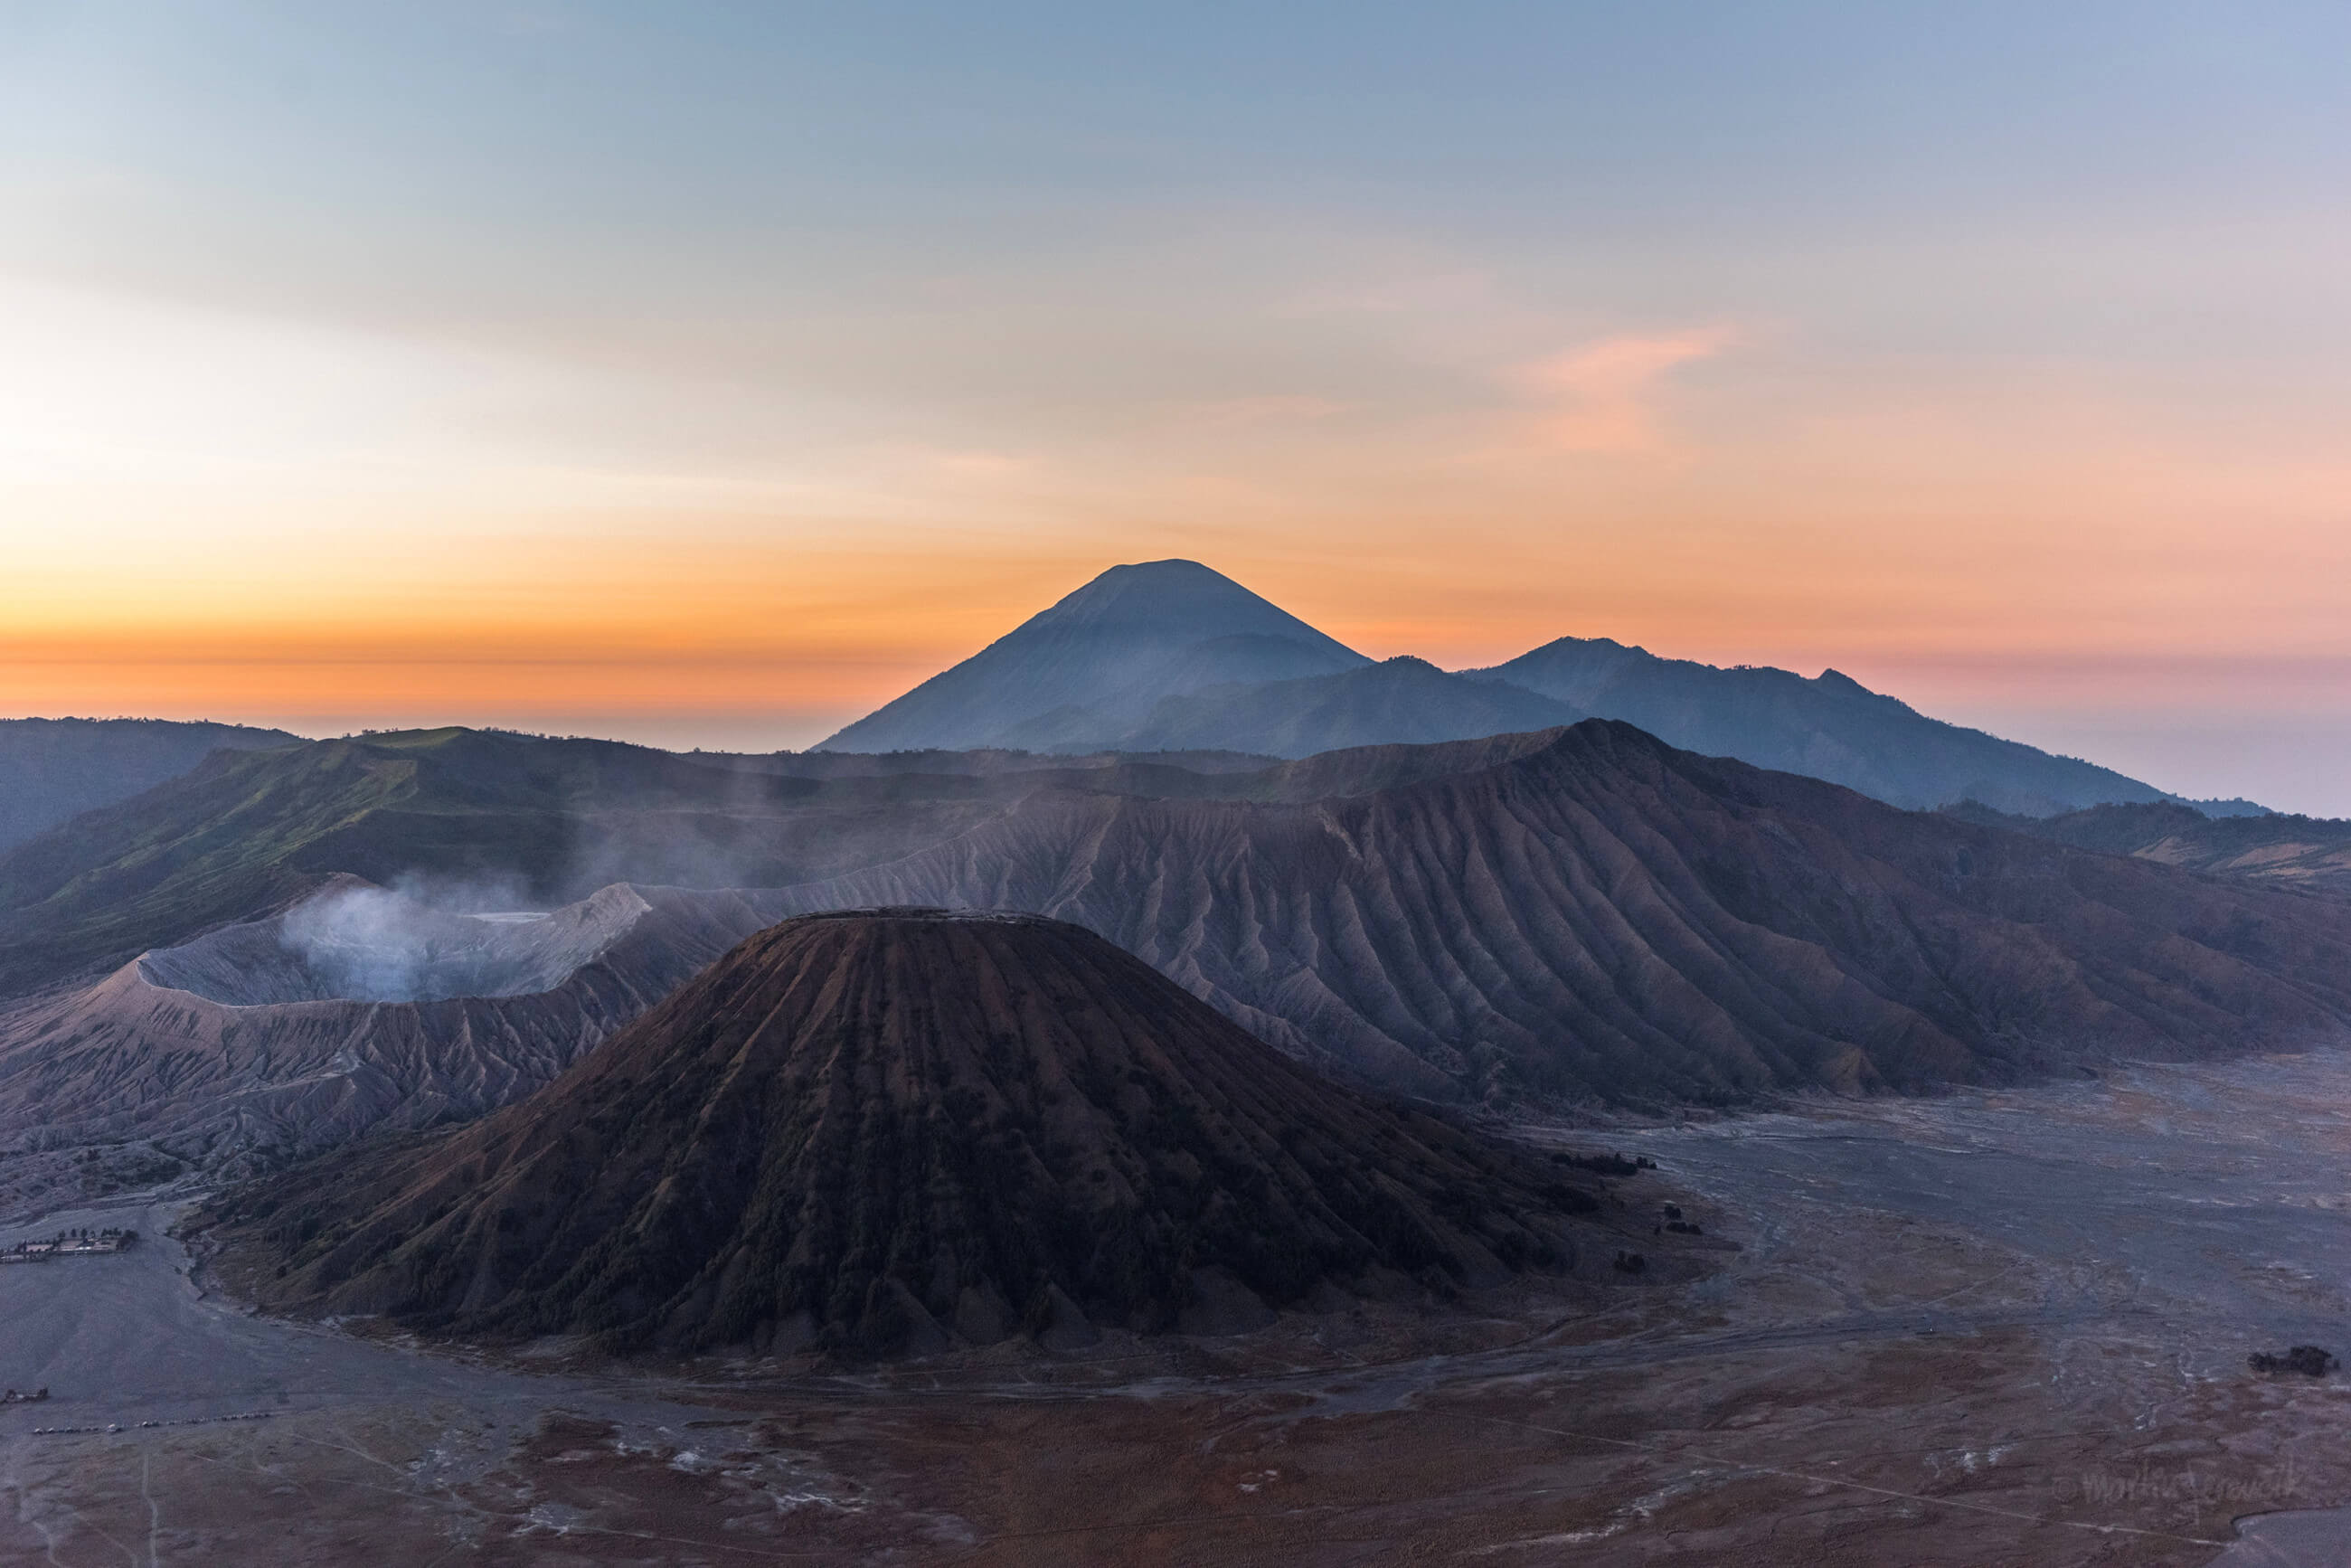 https://bubo.sk/uploads/galleries/7542/martinferencik_indonezia_java_bromo_dsc9053.jpg